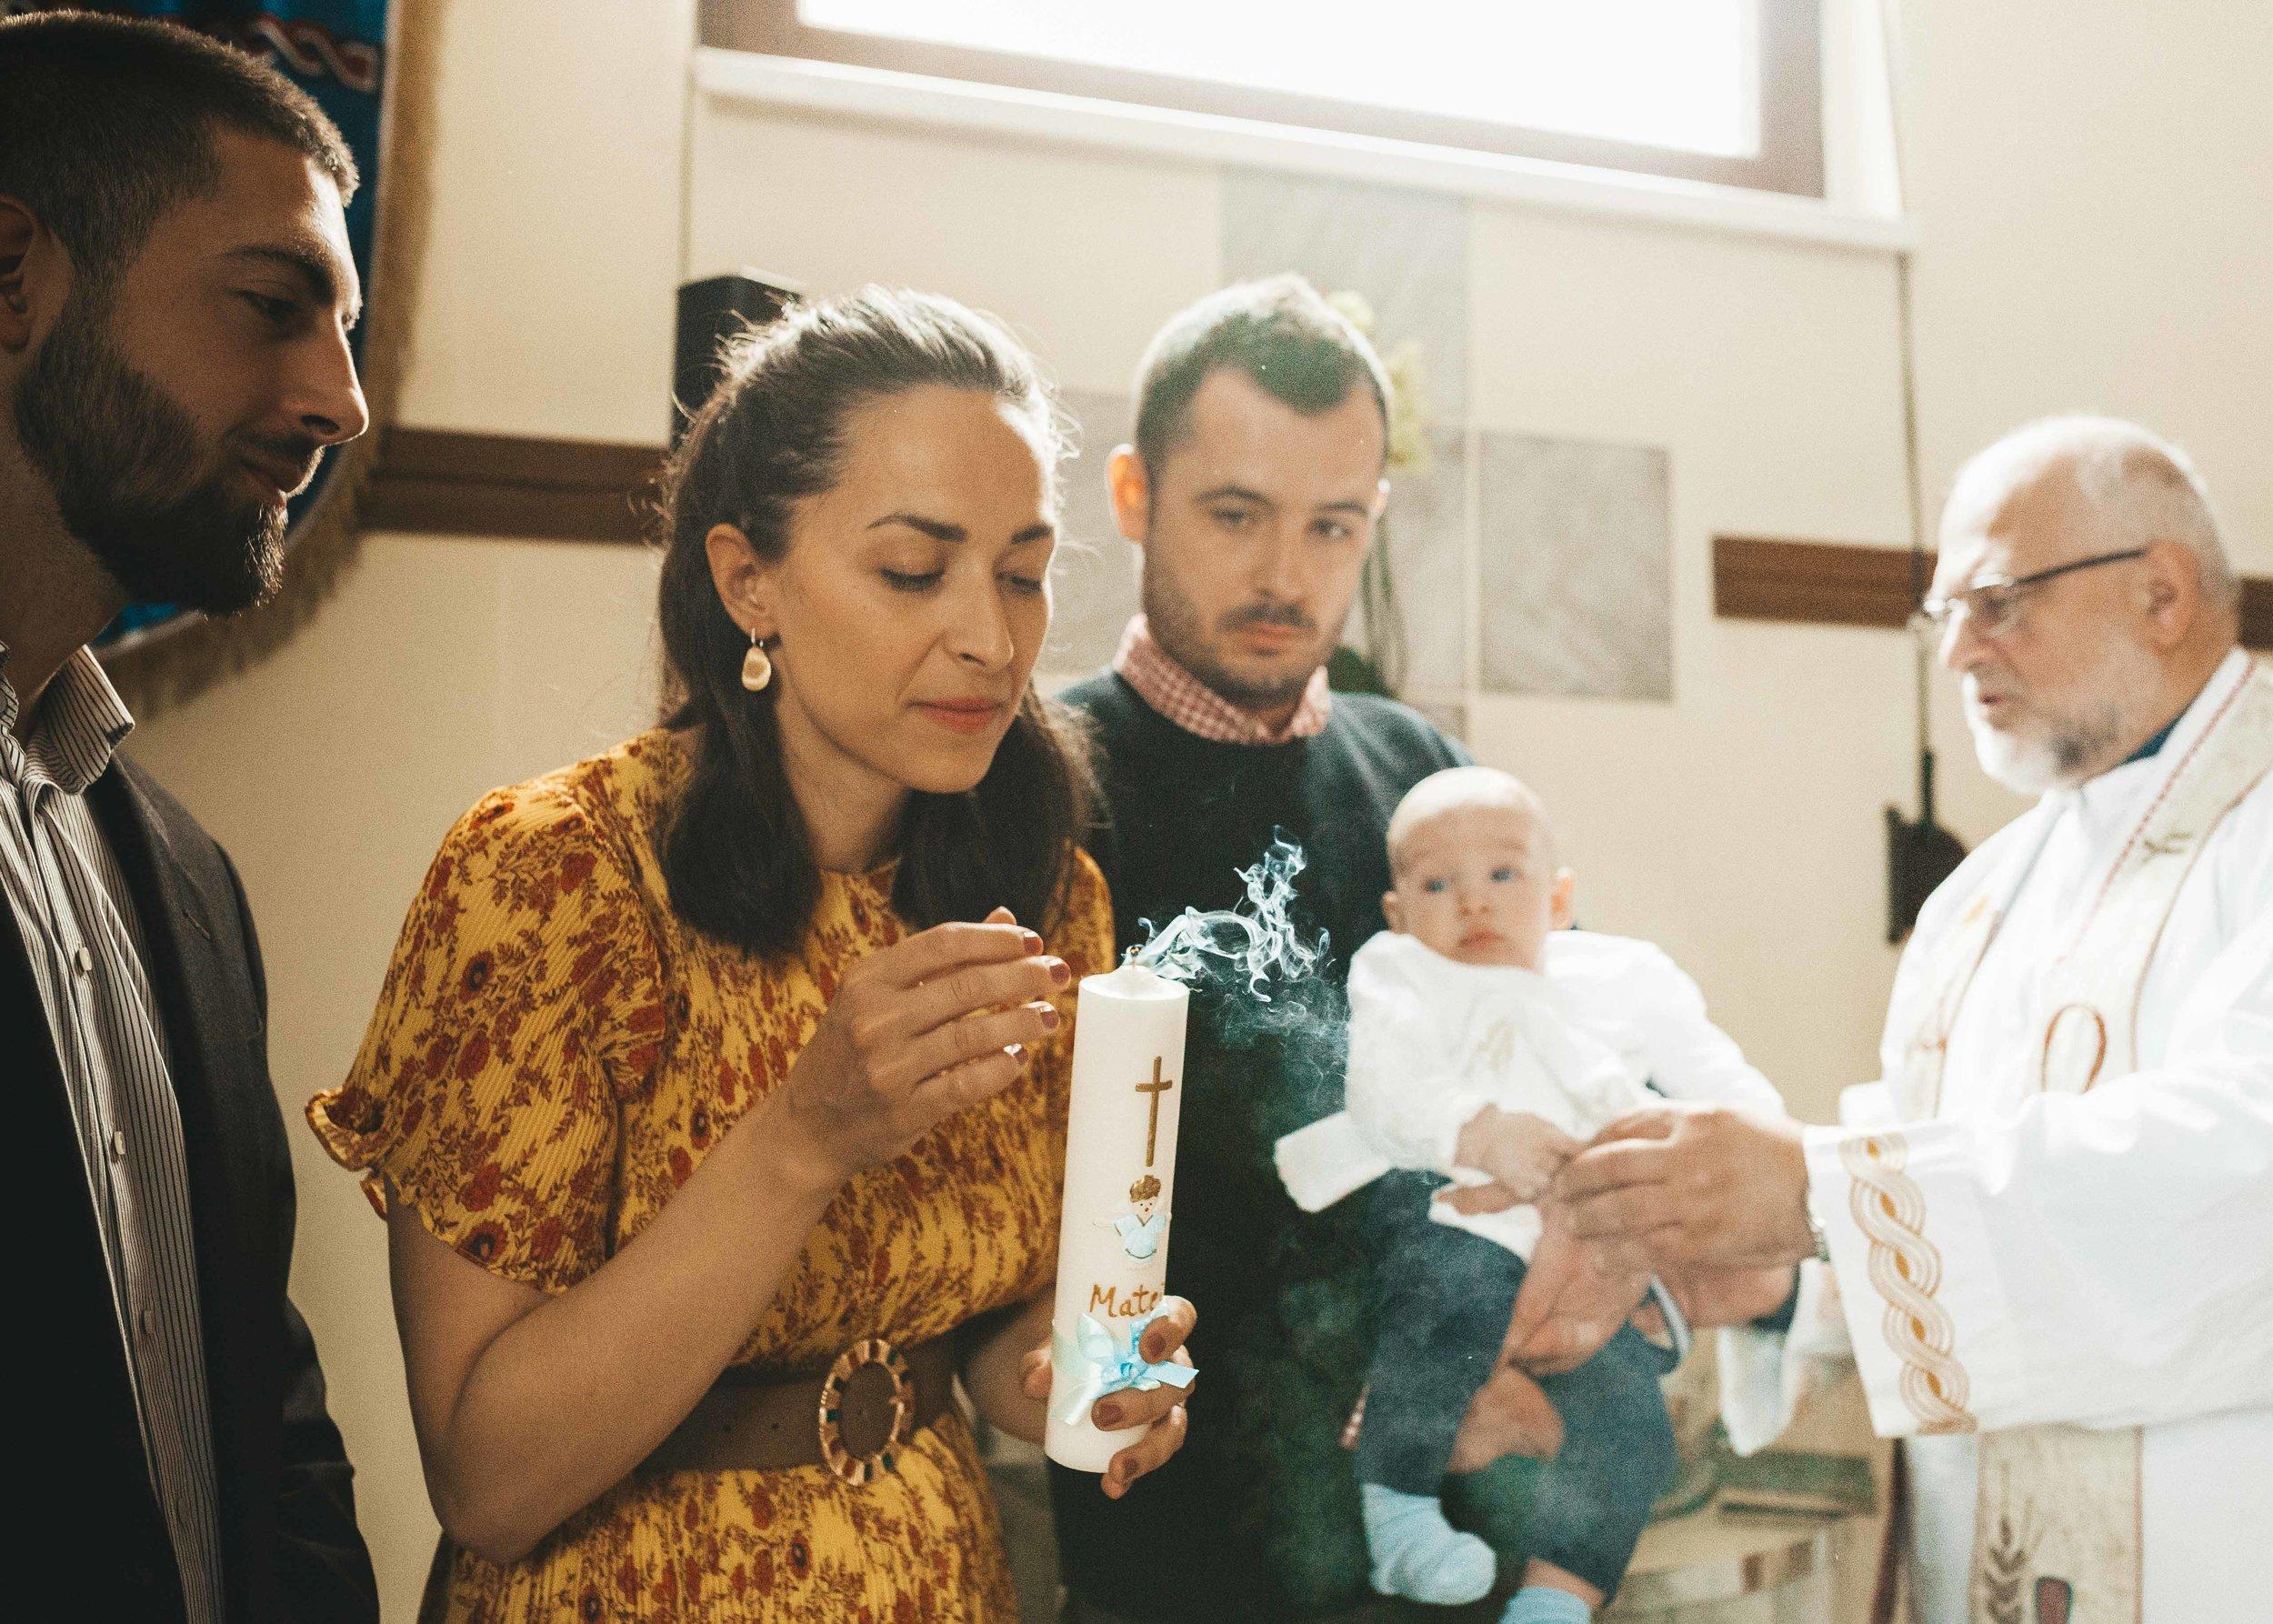 krstenje (26 of 161).jpg